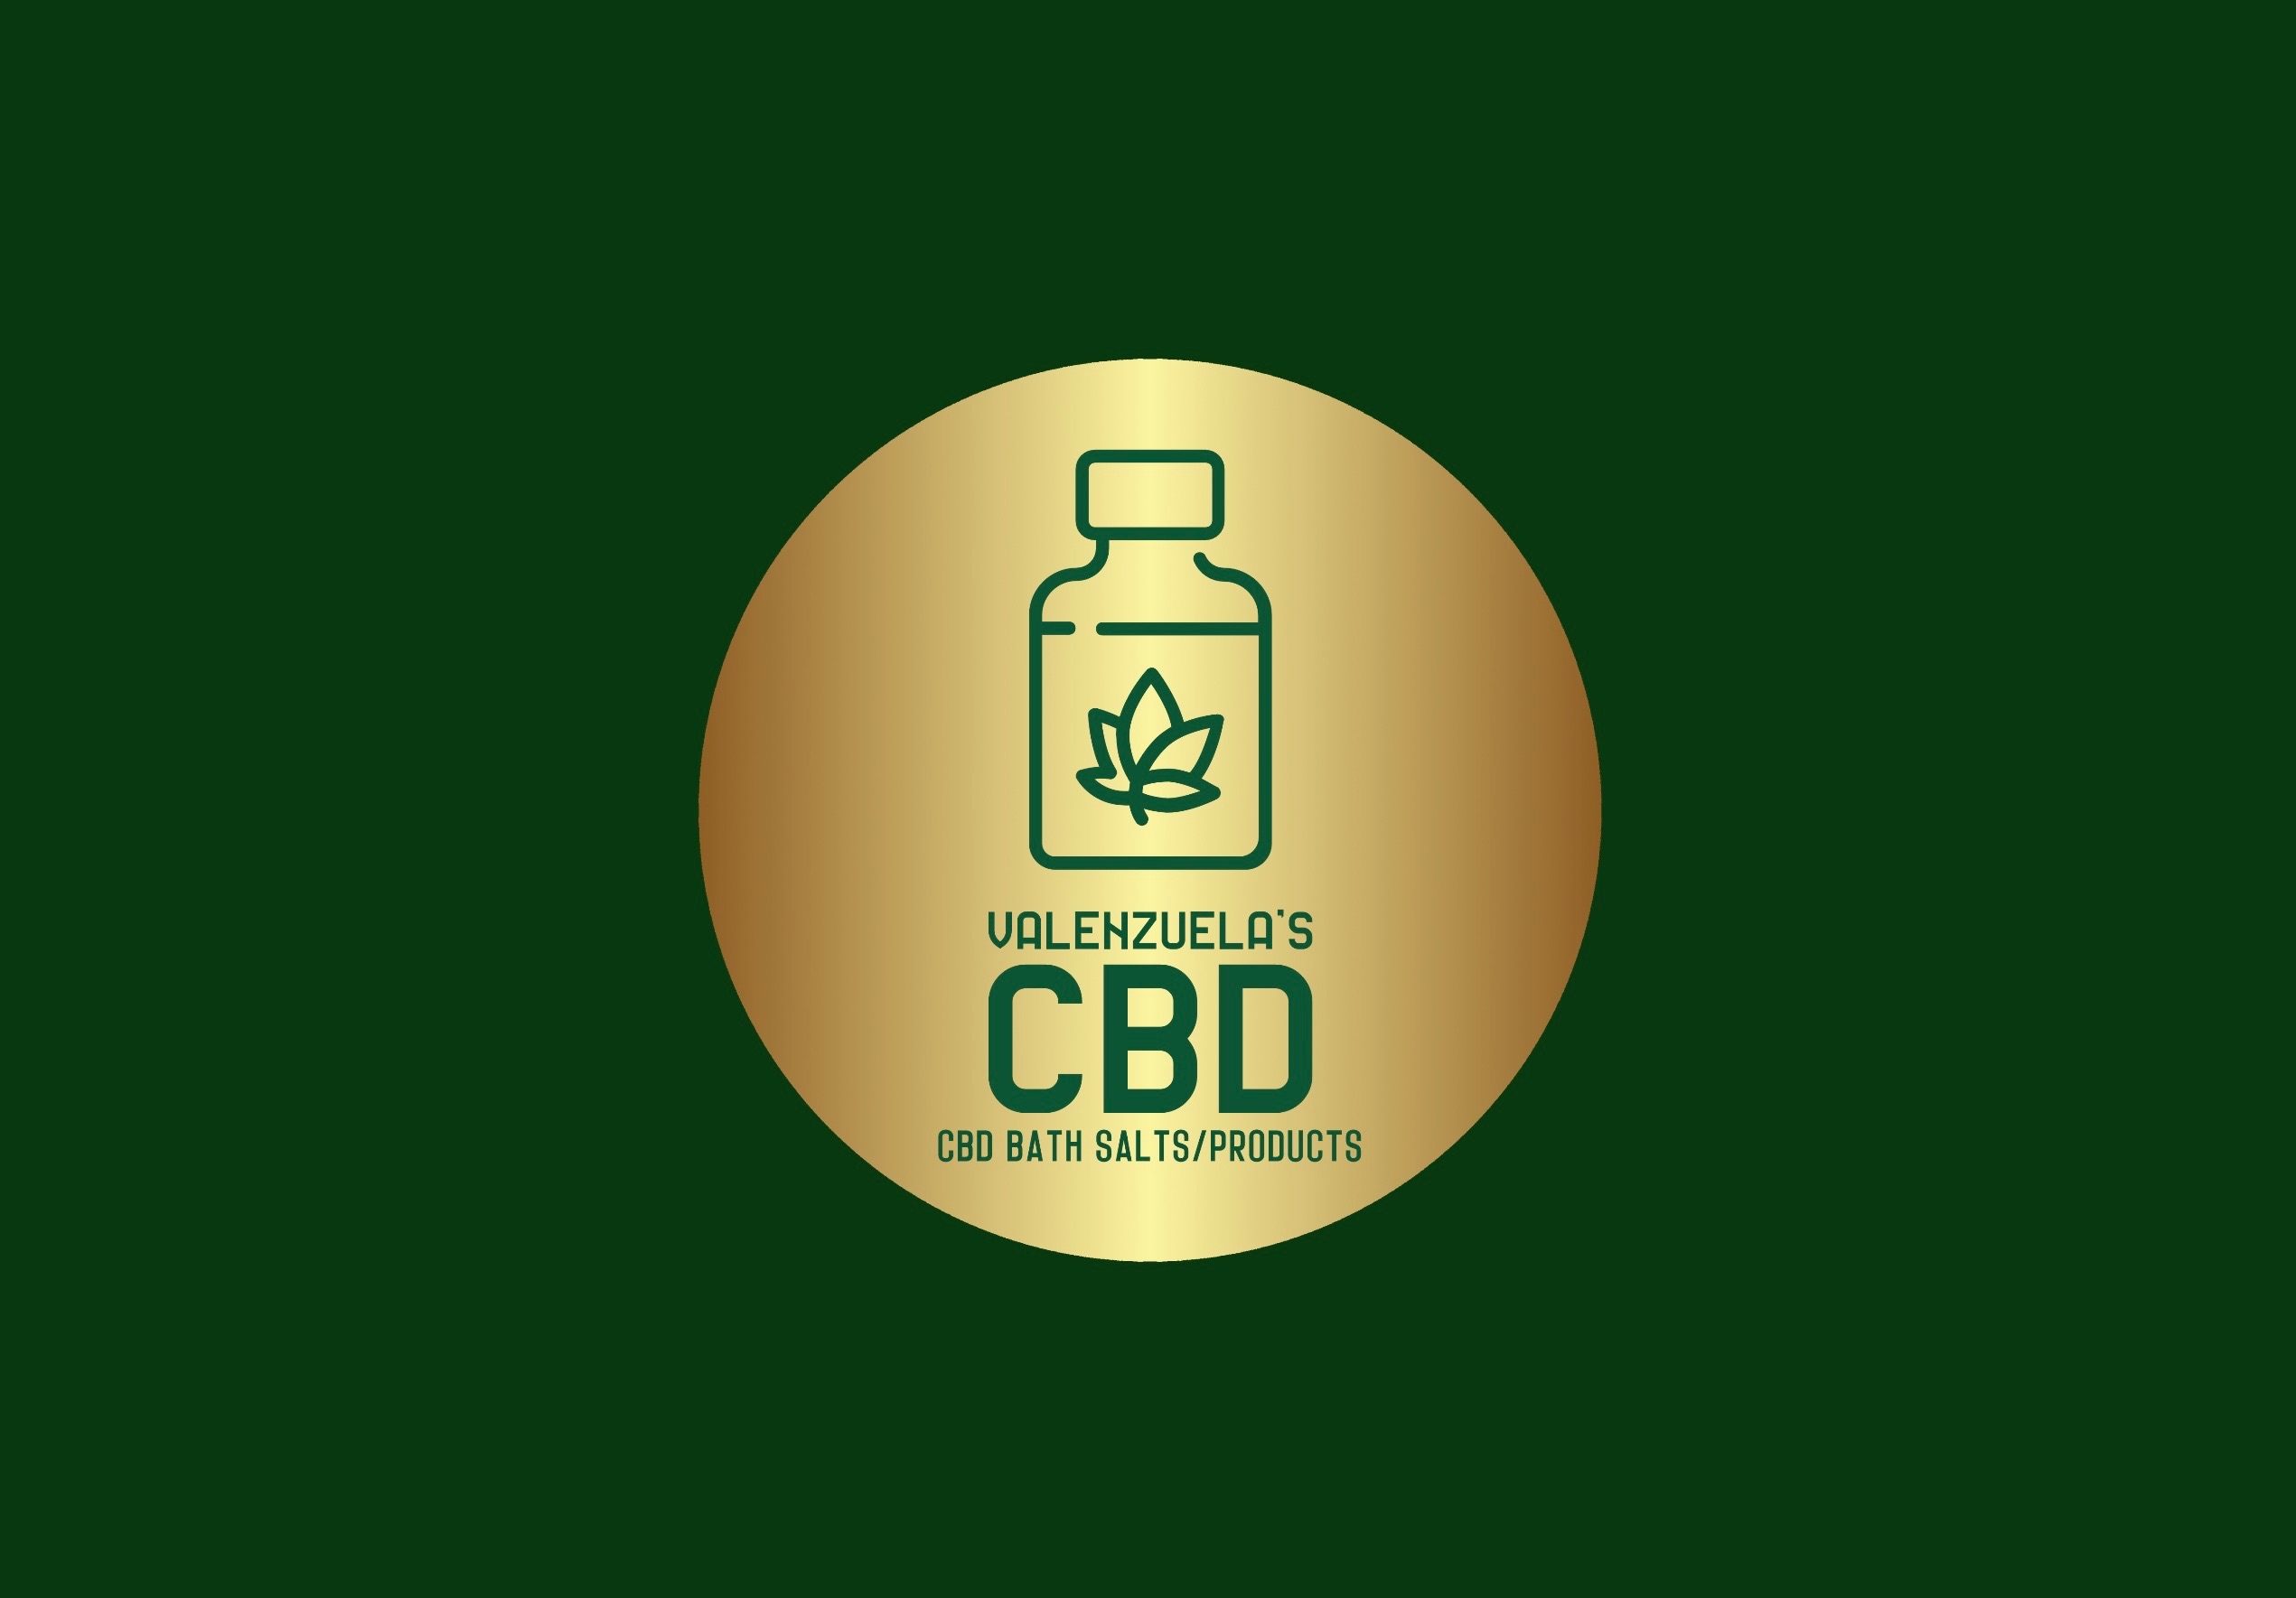 Valenzuela's CBD Products